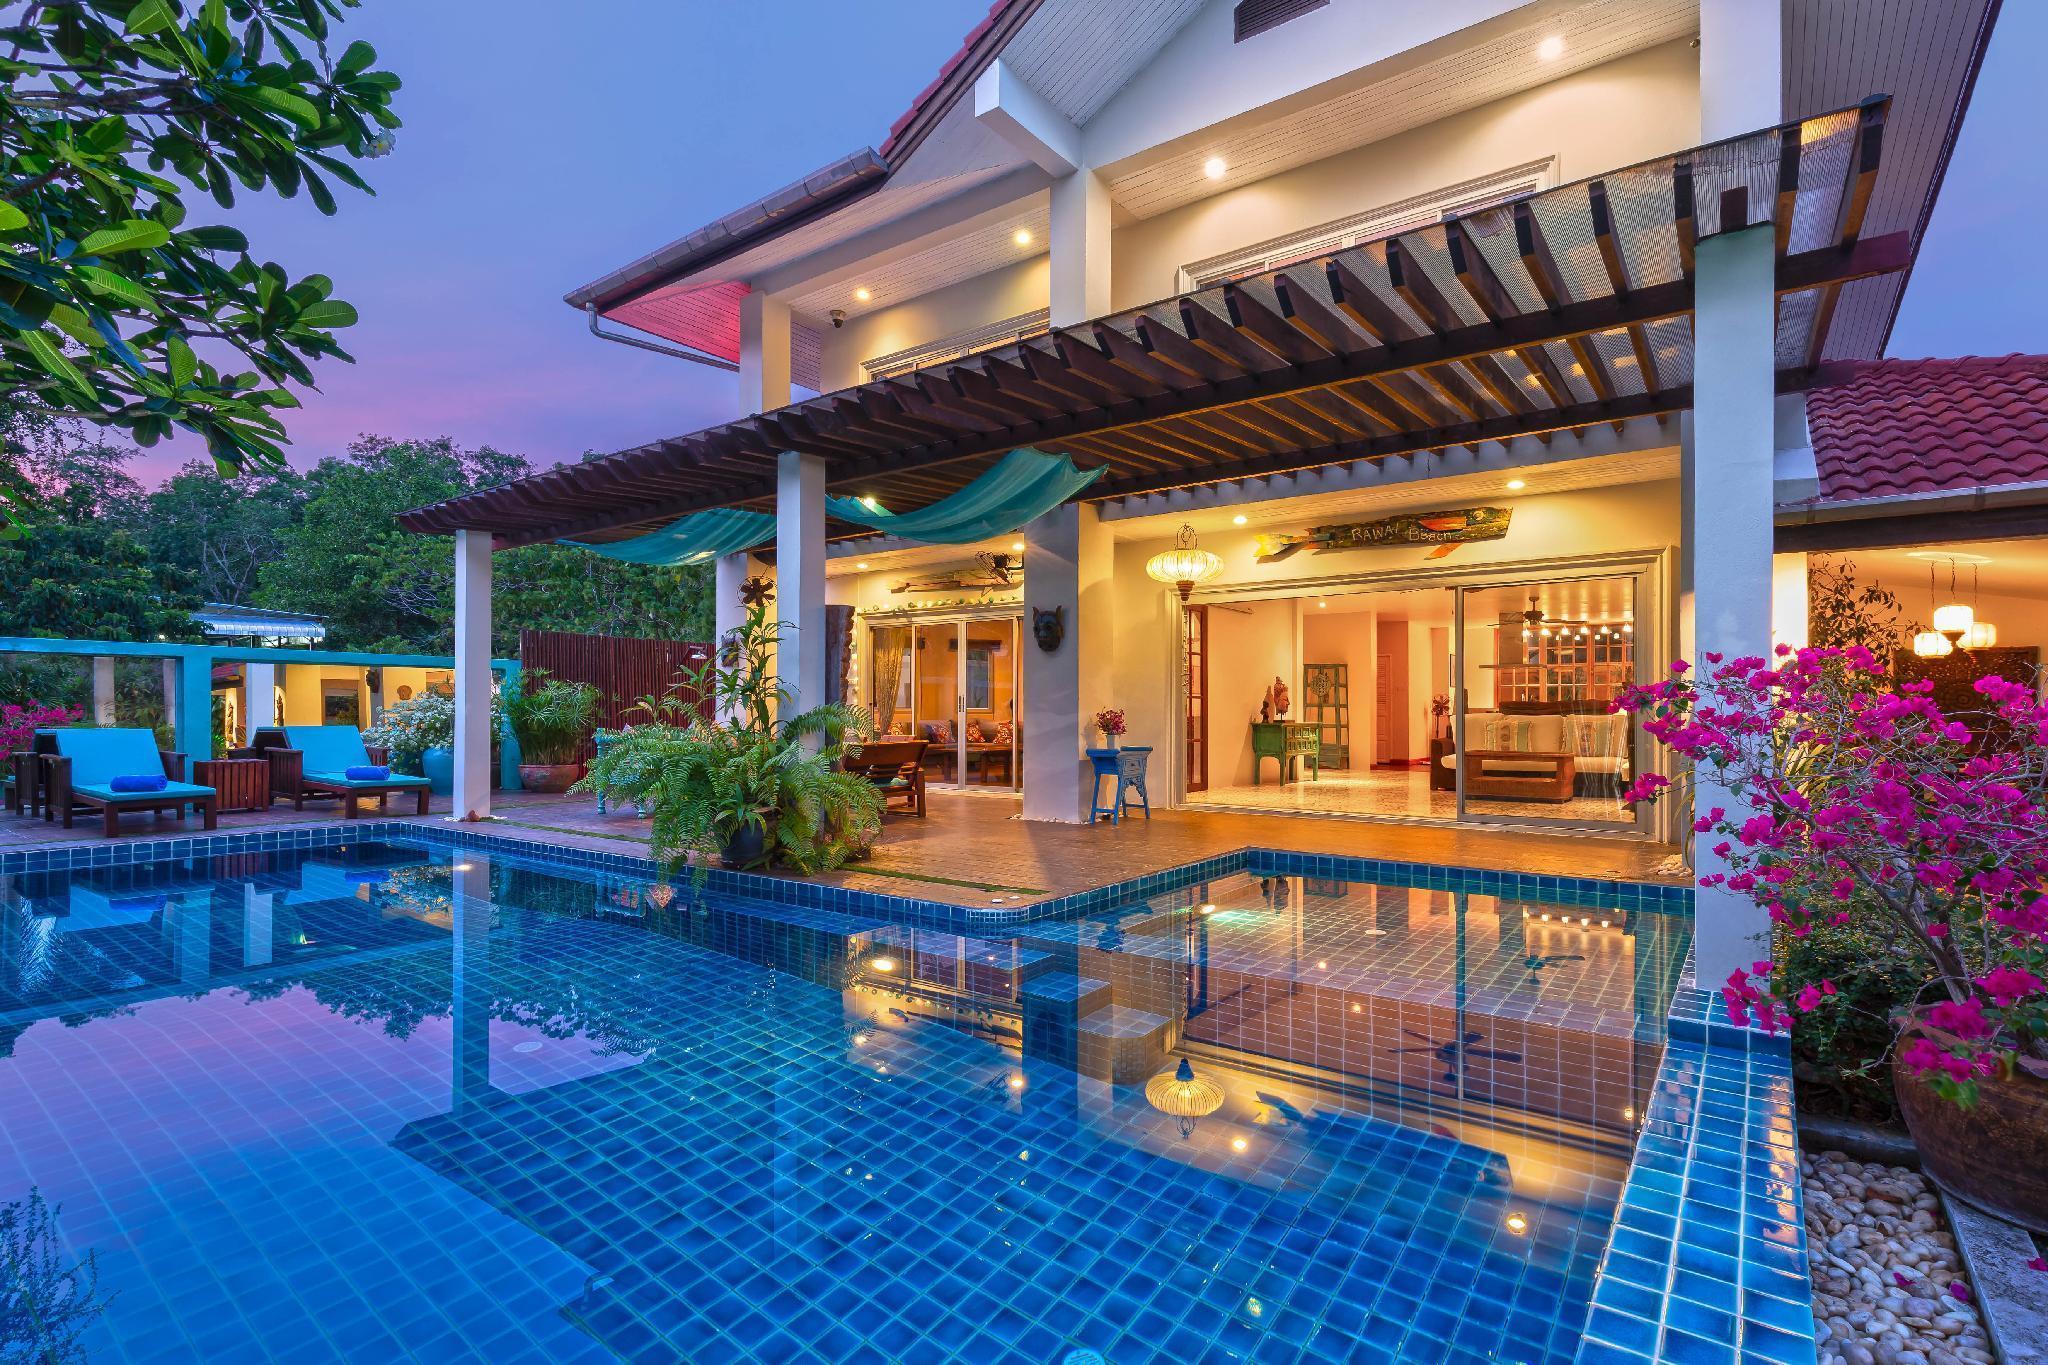 Artful 3-bedroom Pool Villa, lovely garden, Rawai วิลลา 3 ห้องนอน 3 ห้องน้ำส่วนตัว ขนาด 200 ตร.ม. – ในหาน